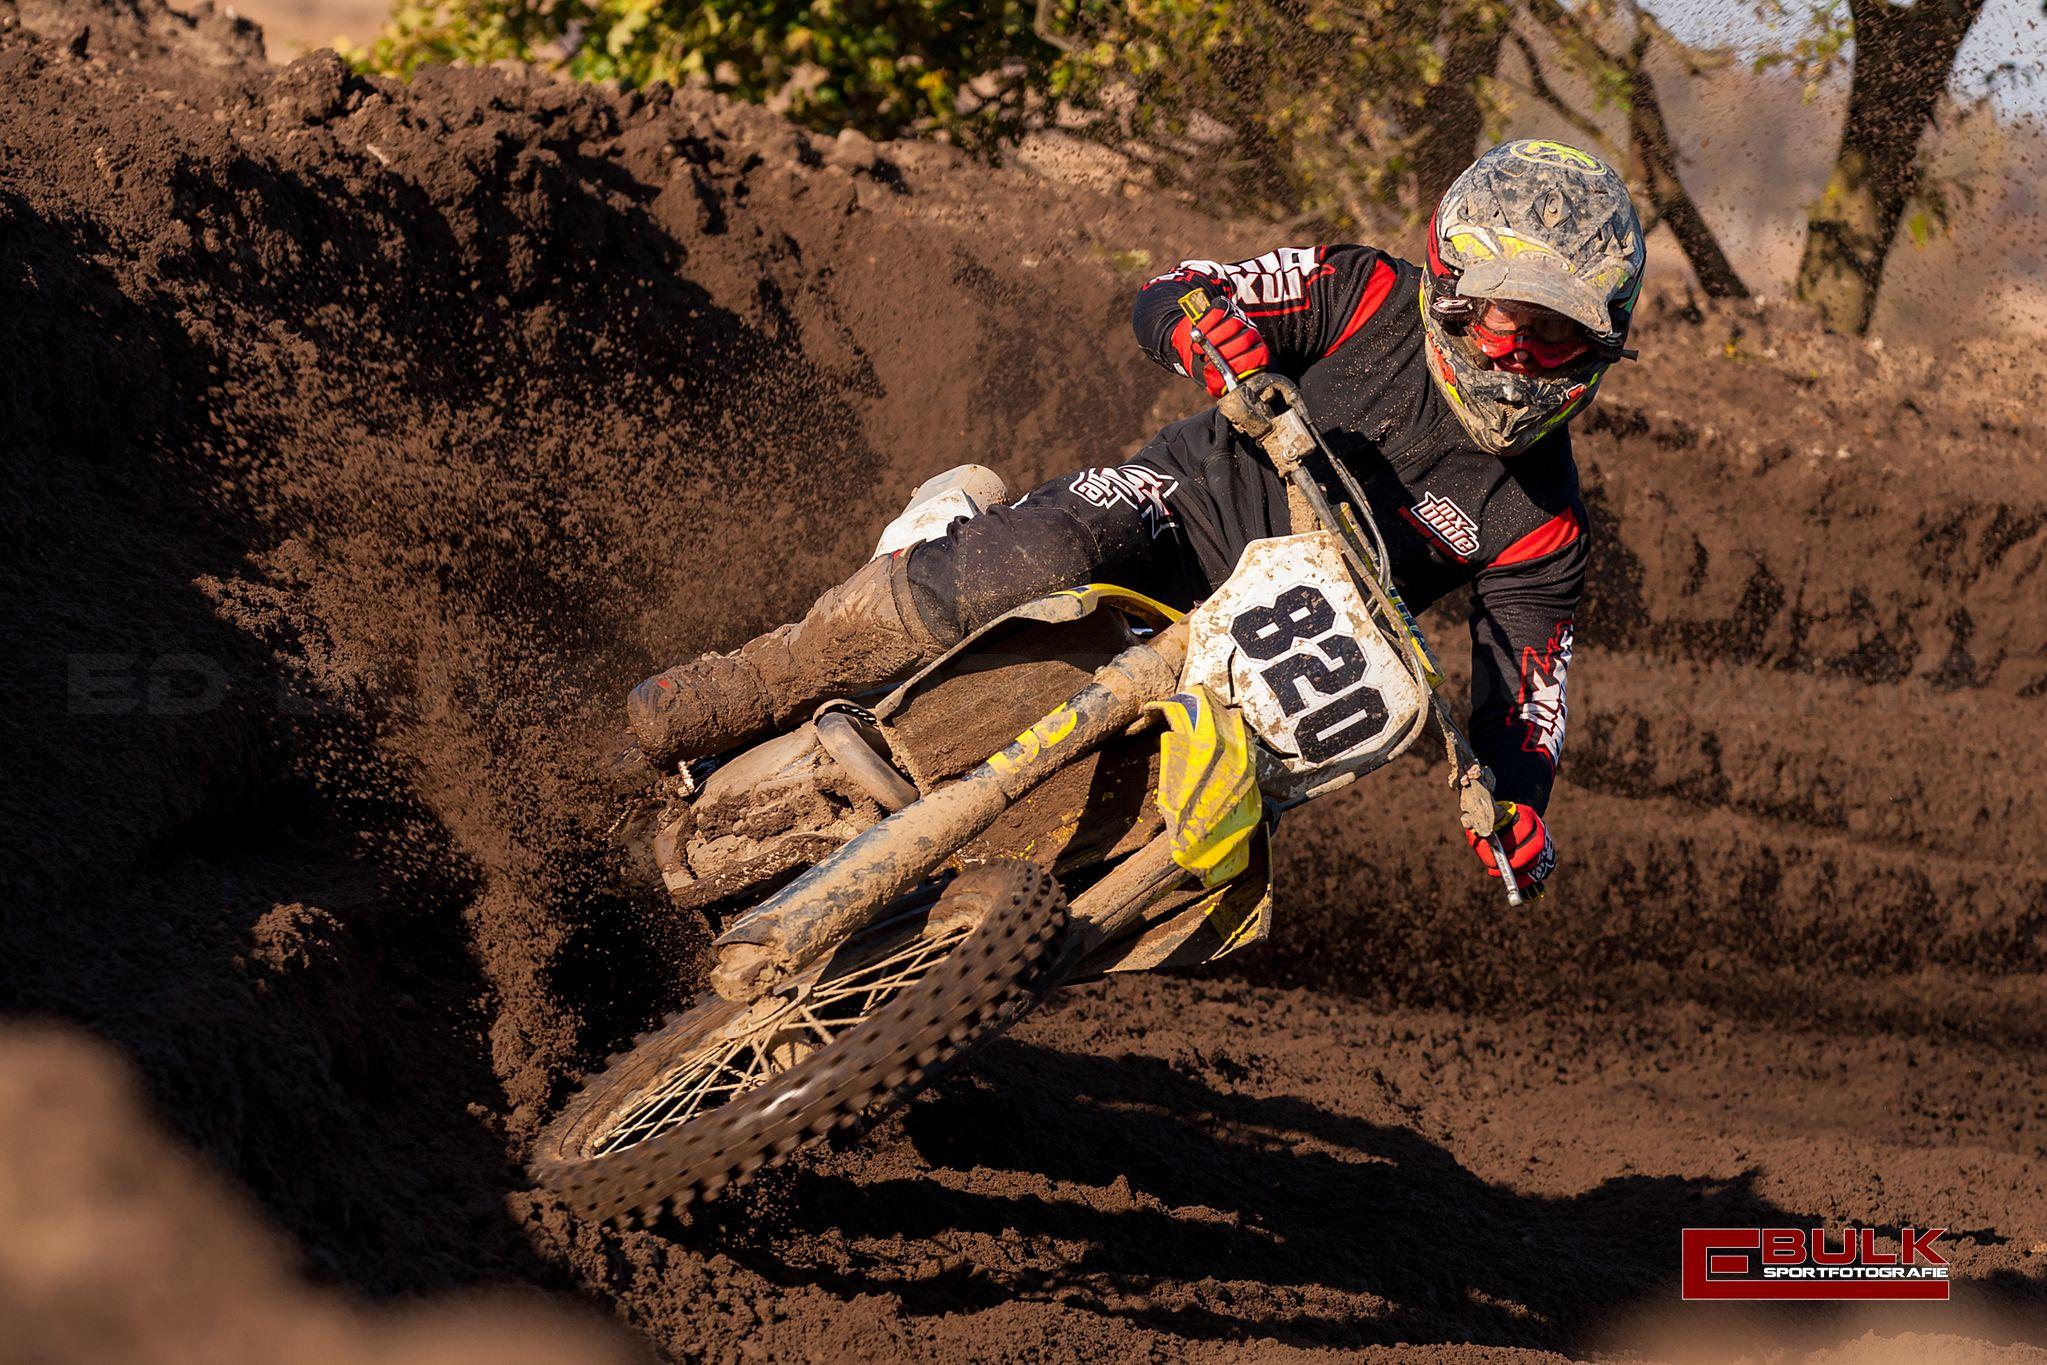 ebs_0240-ed_bulk_sportfotografie